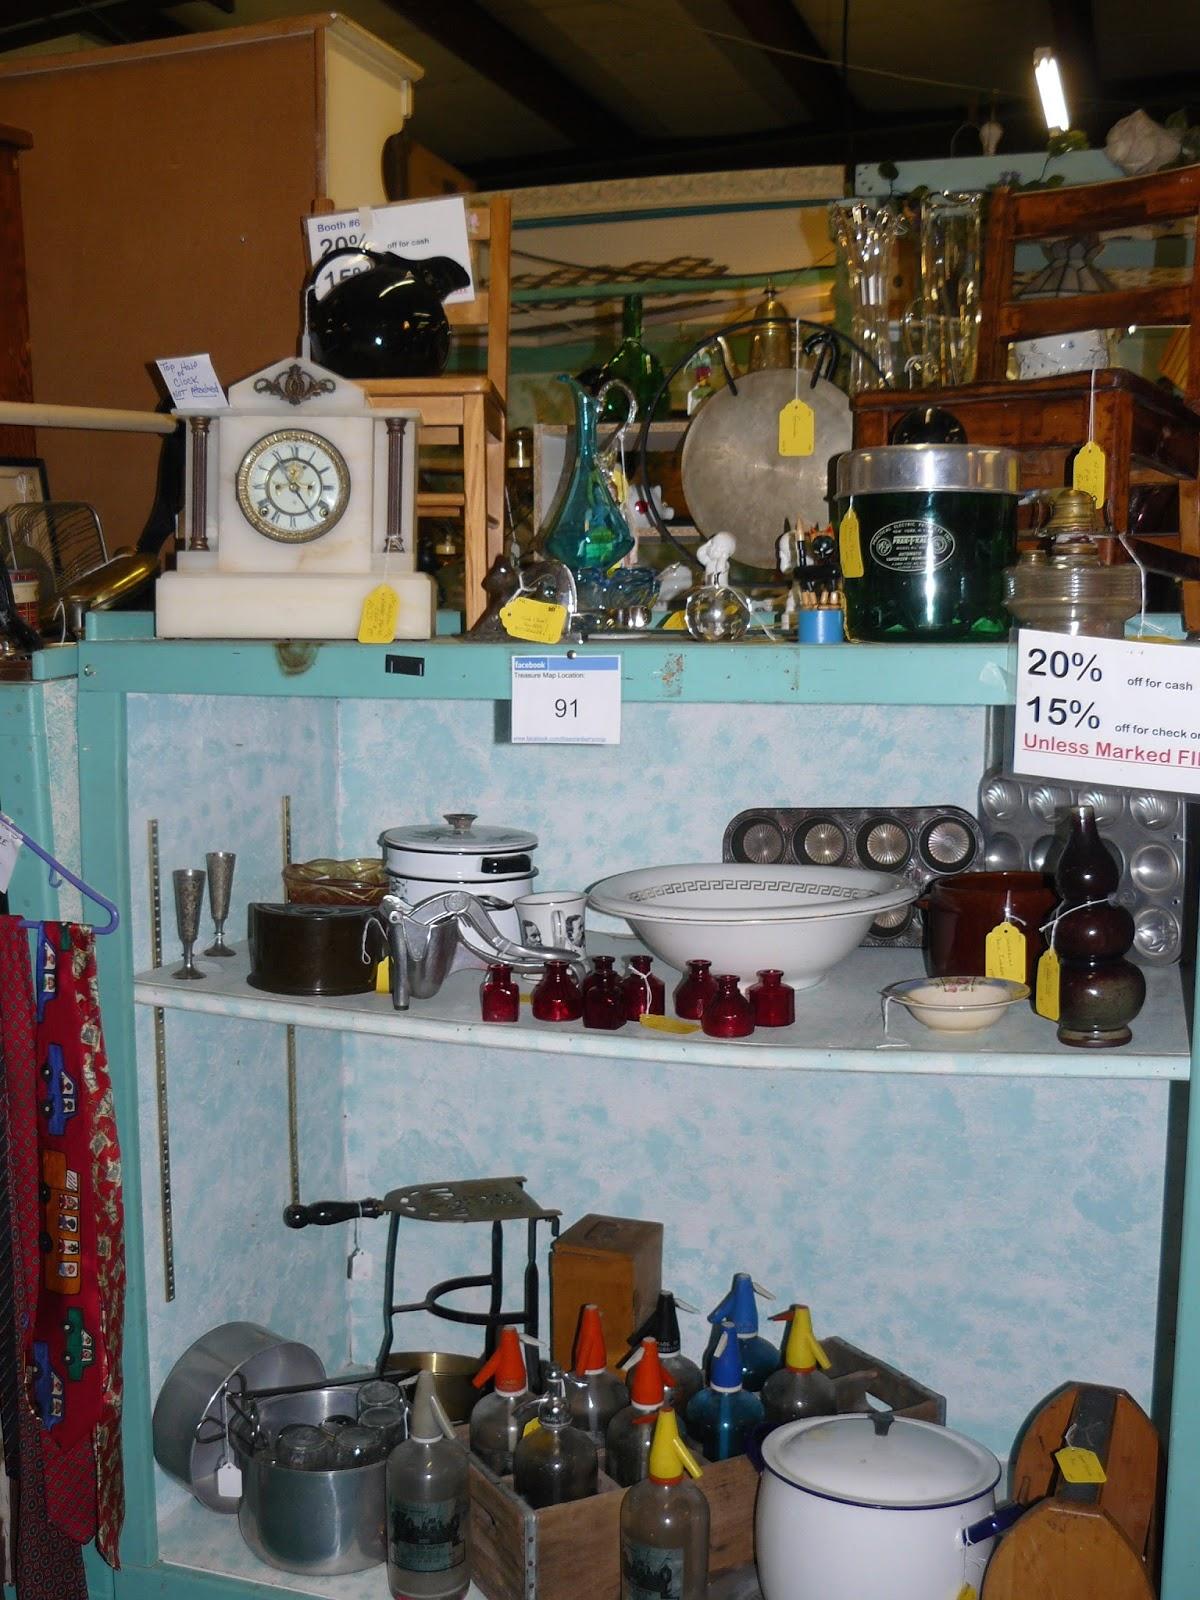 Scranberry Coop Antique Marble Mantle Clock At